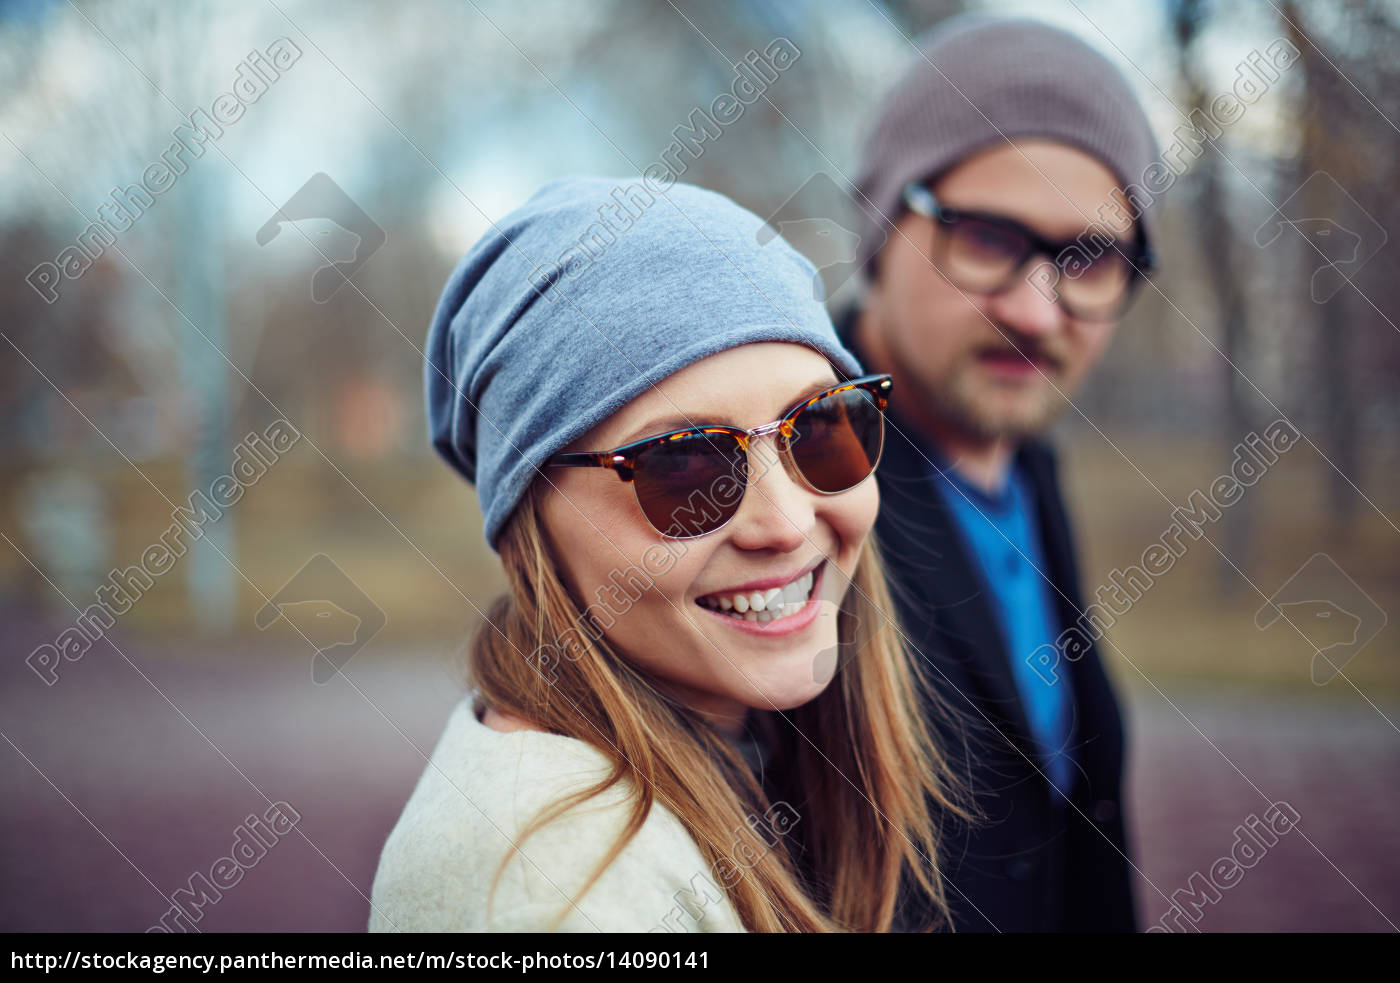 stylish, girl - 14090141